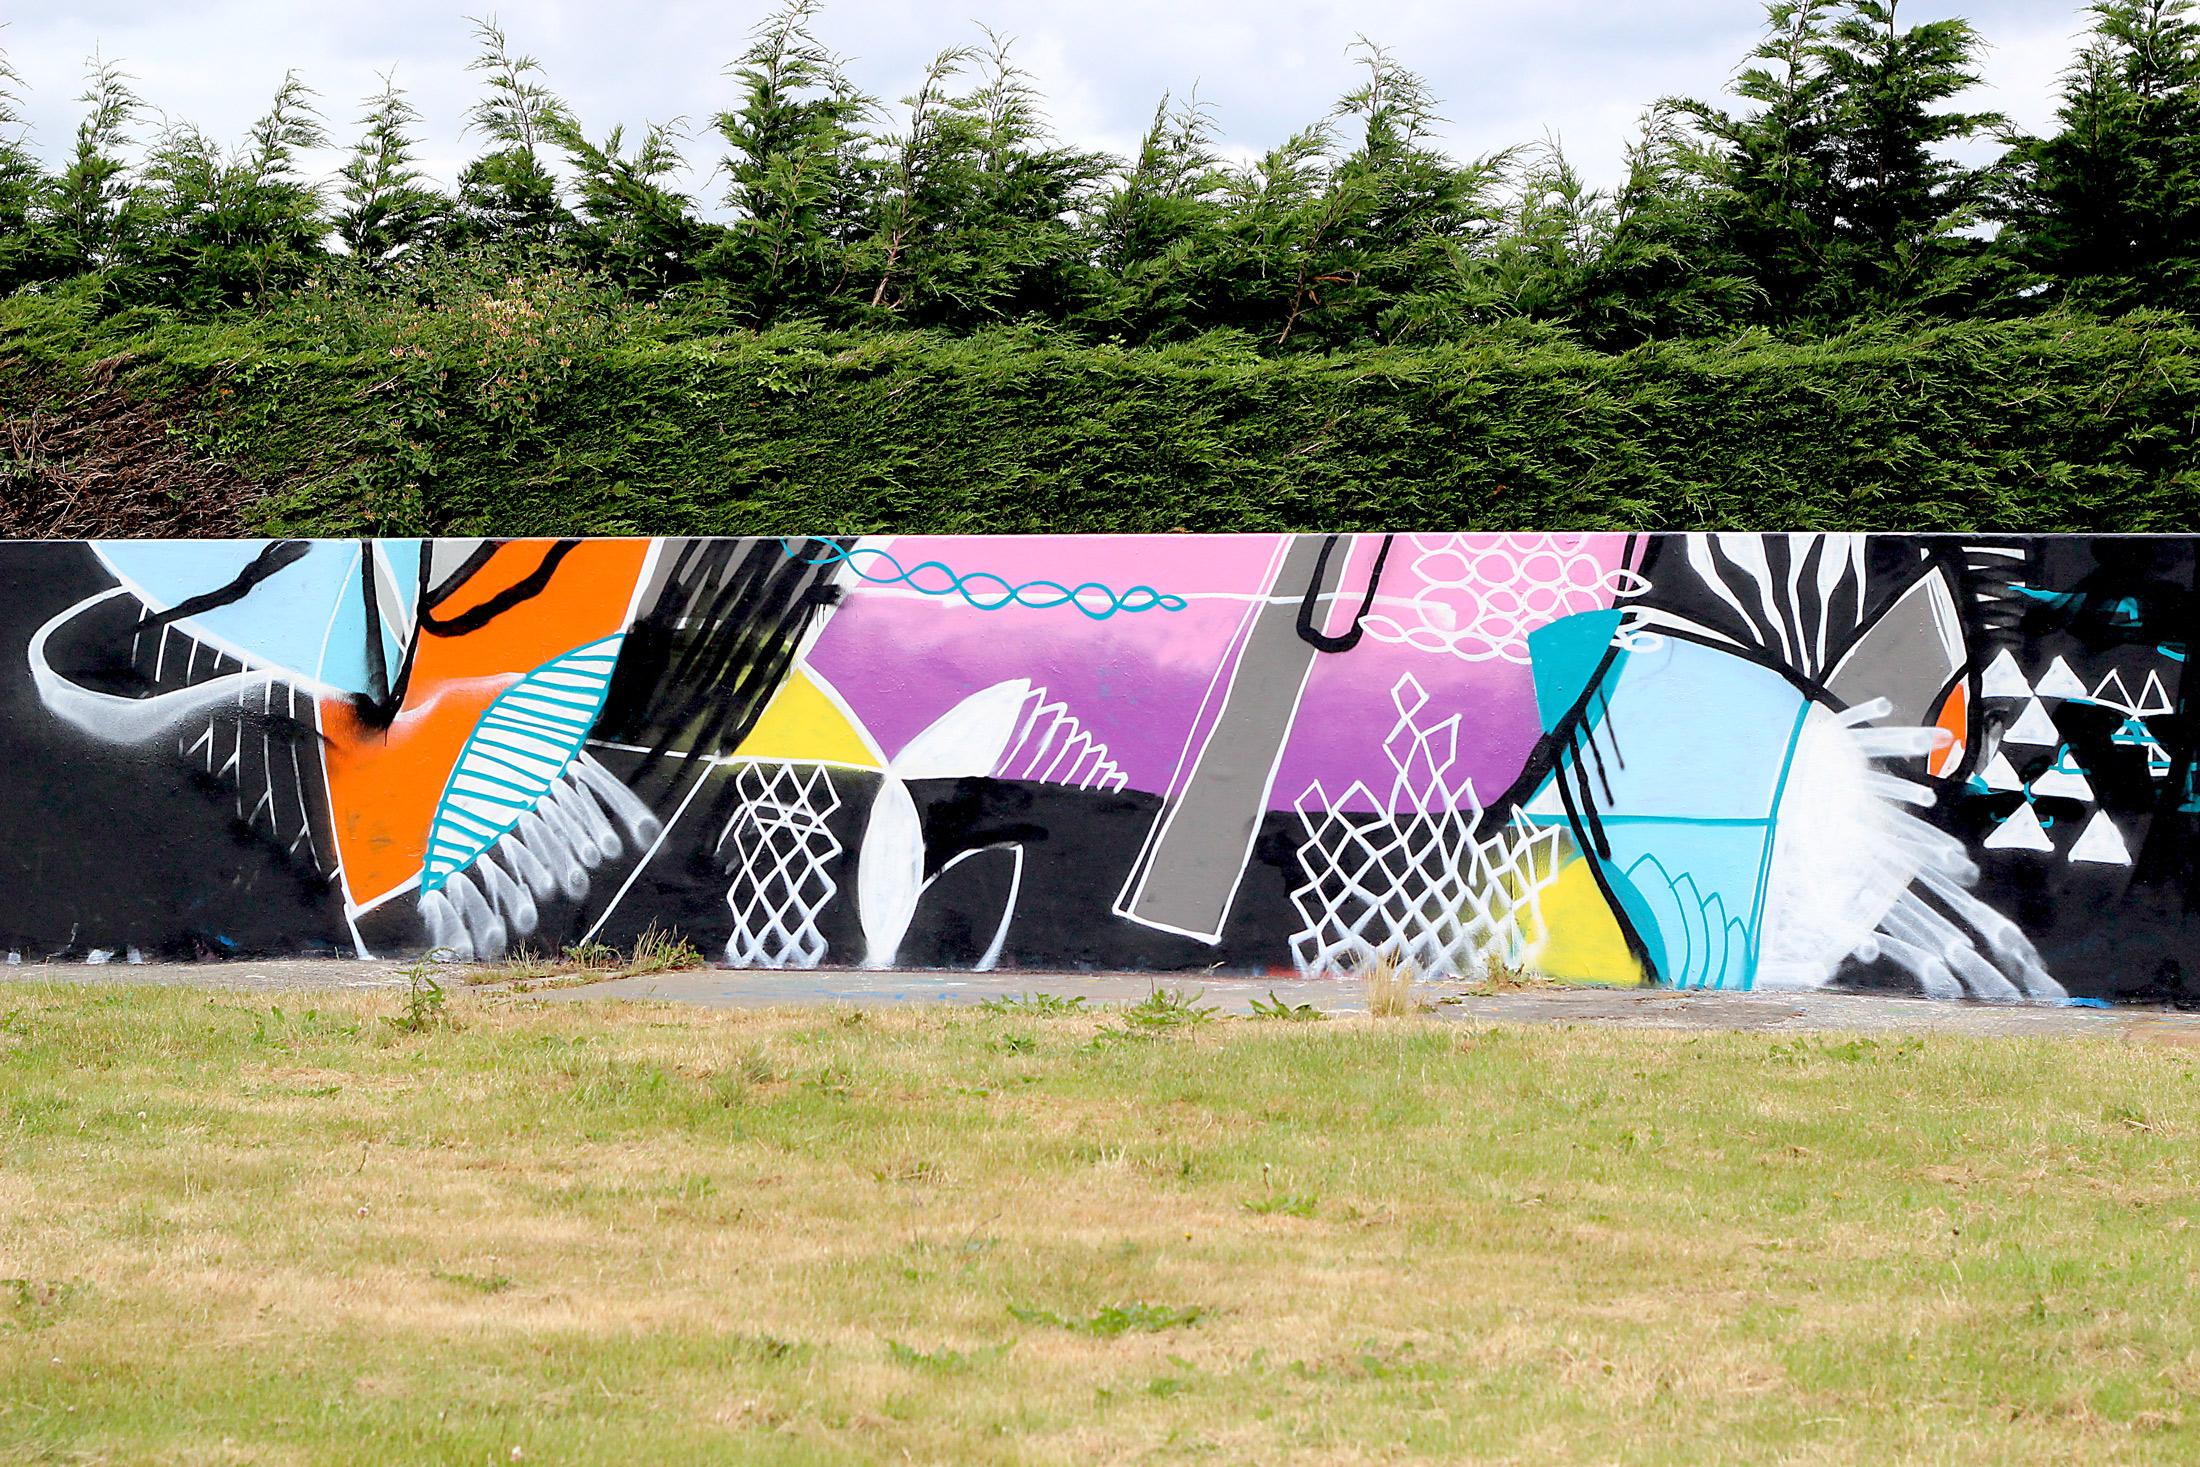 abstract-graffiti-mural-callington-street-art-cornwall-2020